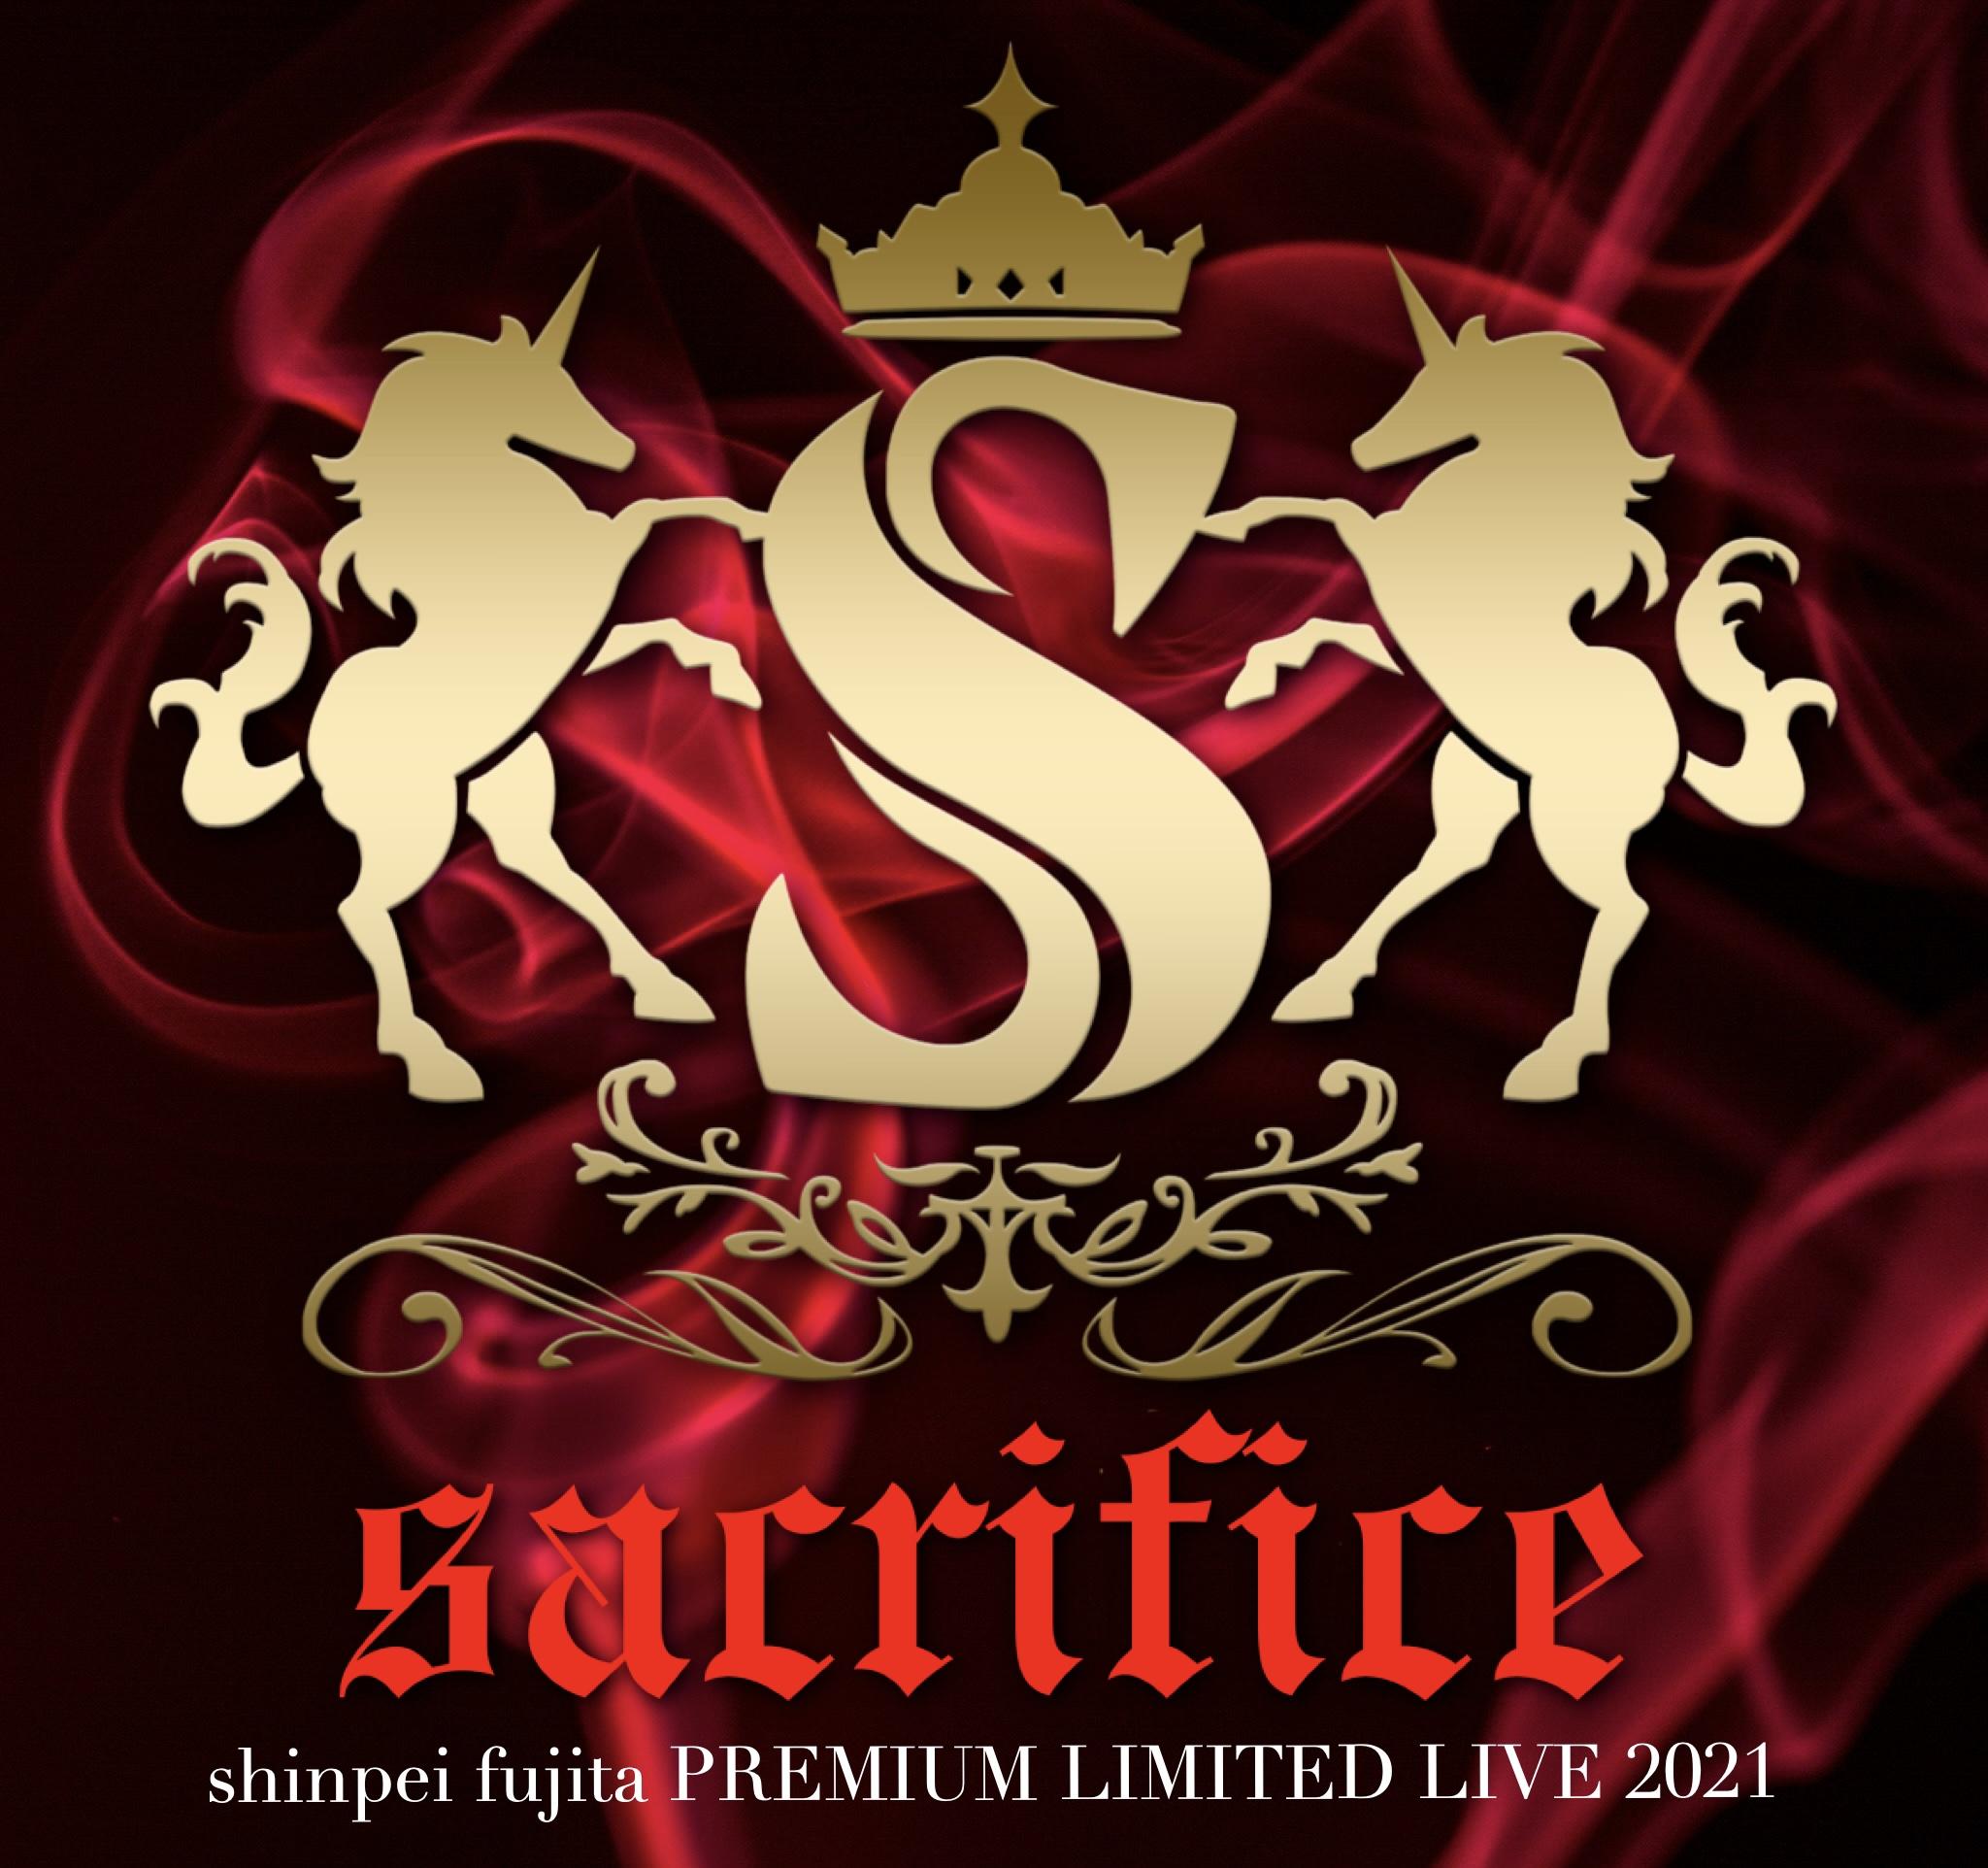 shinpei fujita PREMIUM LIMITED LIVE 2021 〜Sacrifice〜